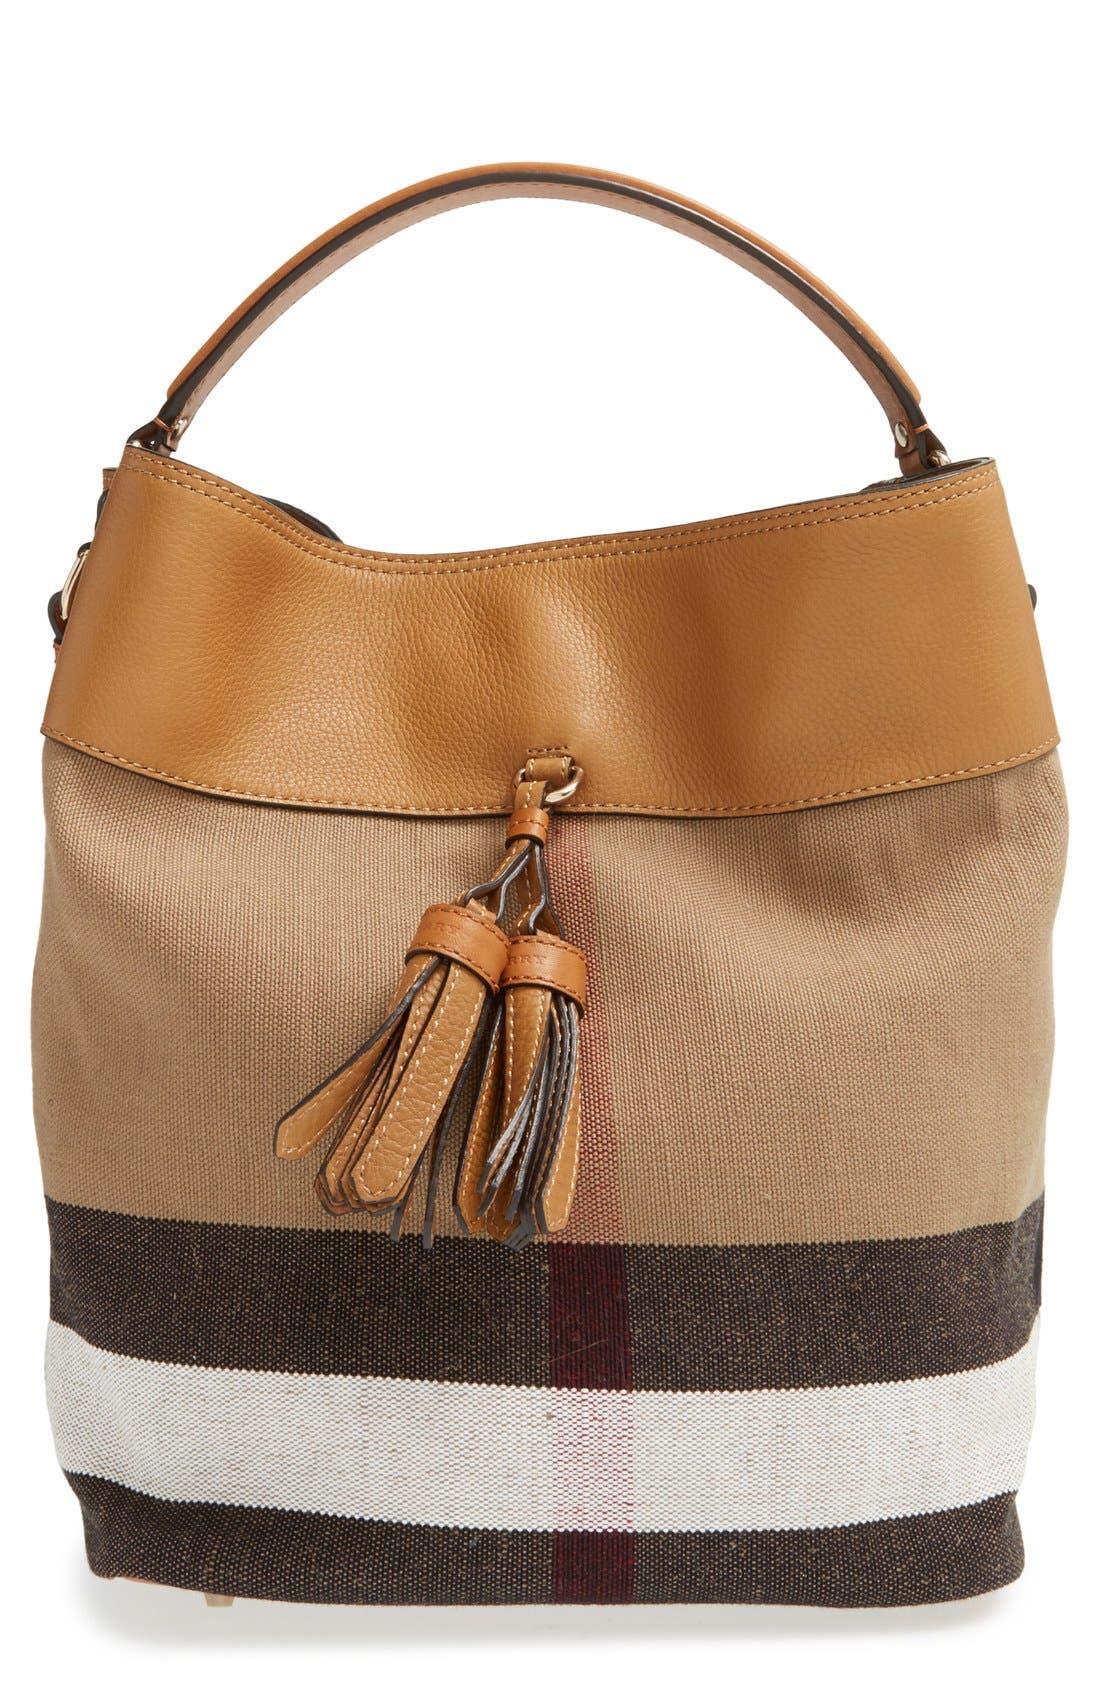 Burberry Medium Ashby Bucket Bag | Nordstrom